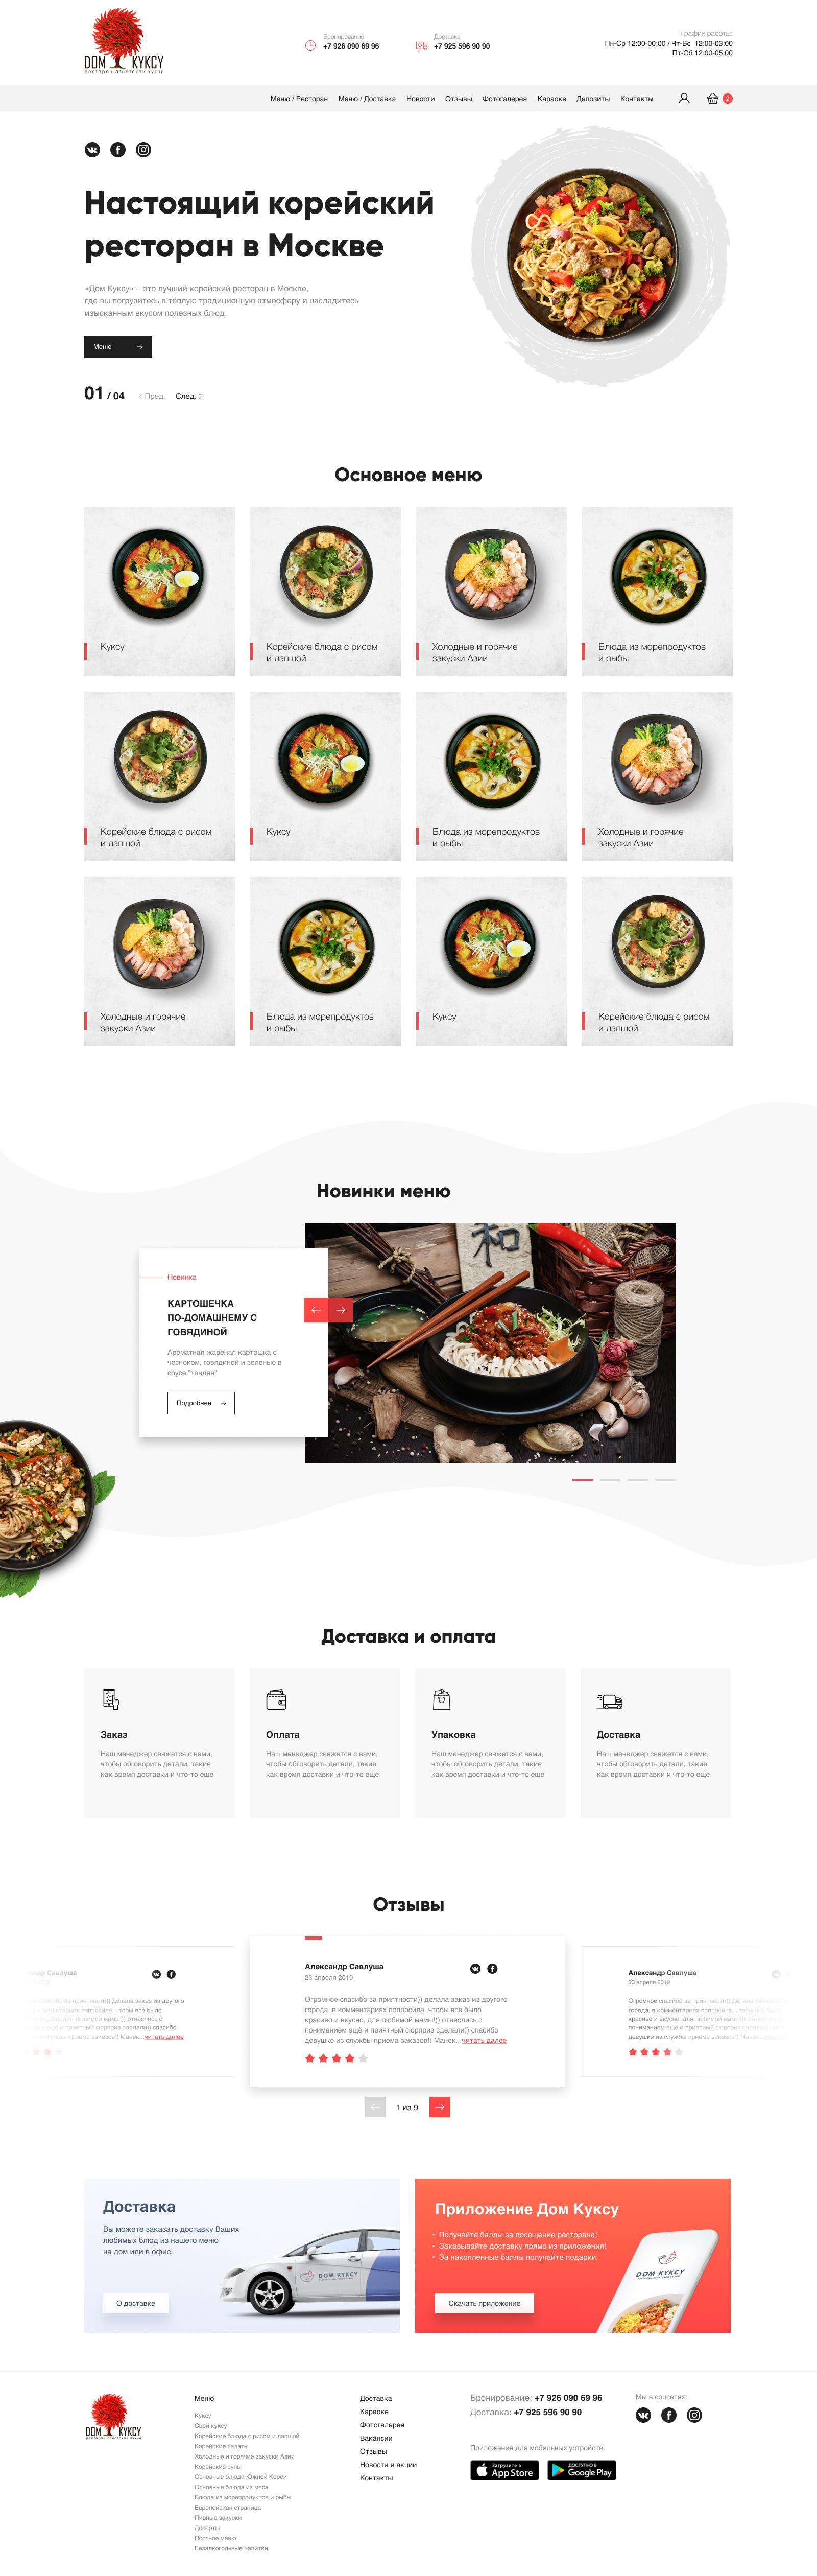 Ресторан азиатской кухни Дом Куксу